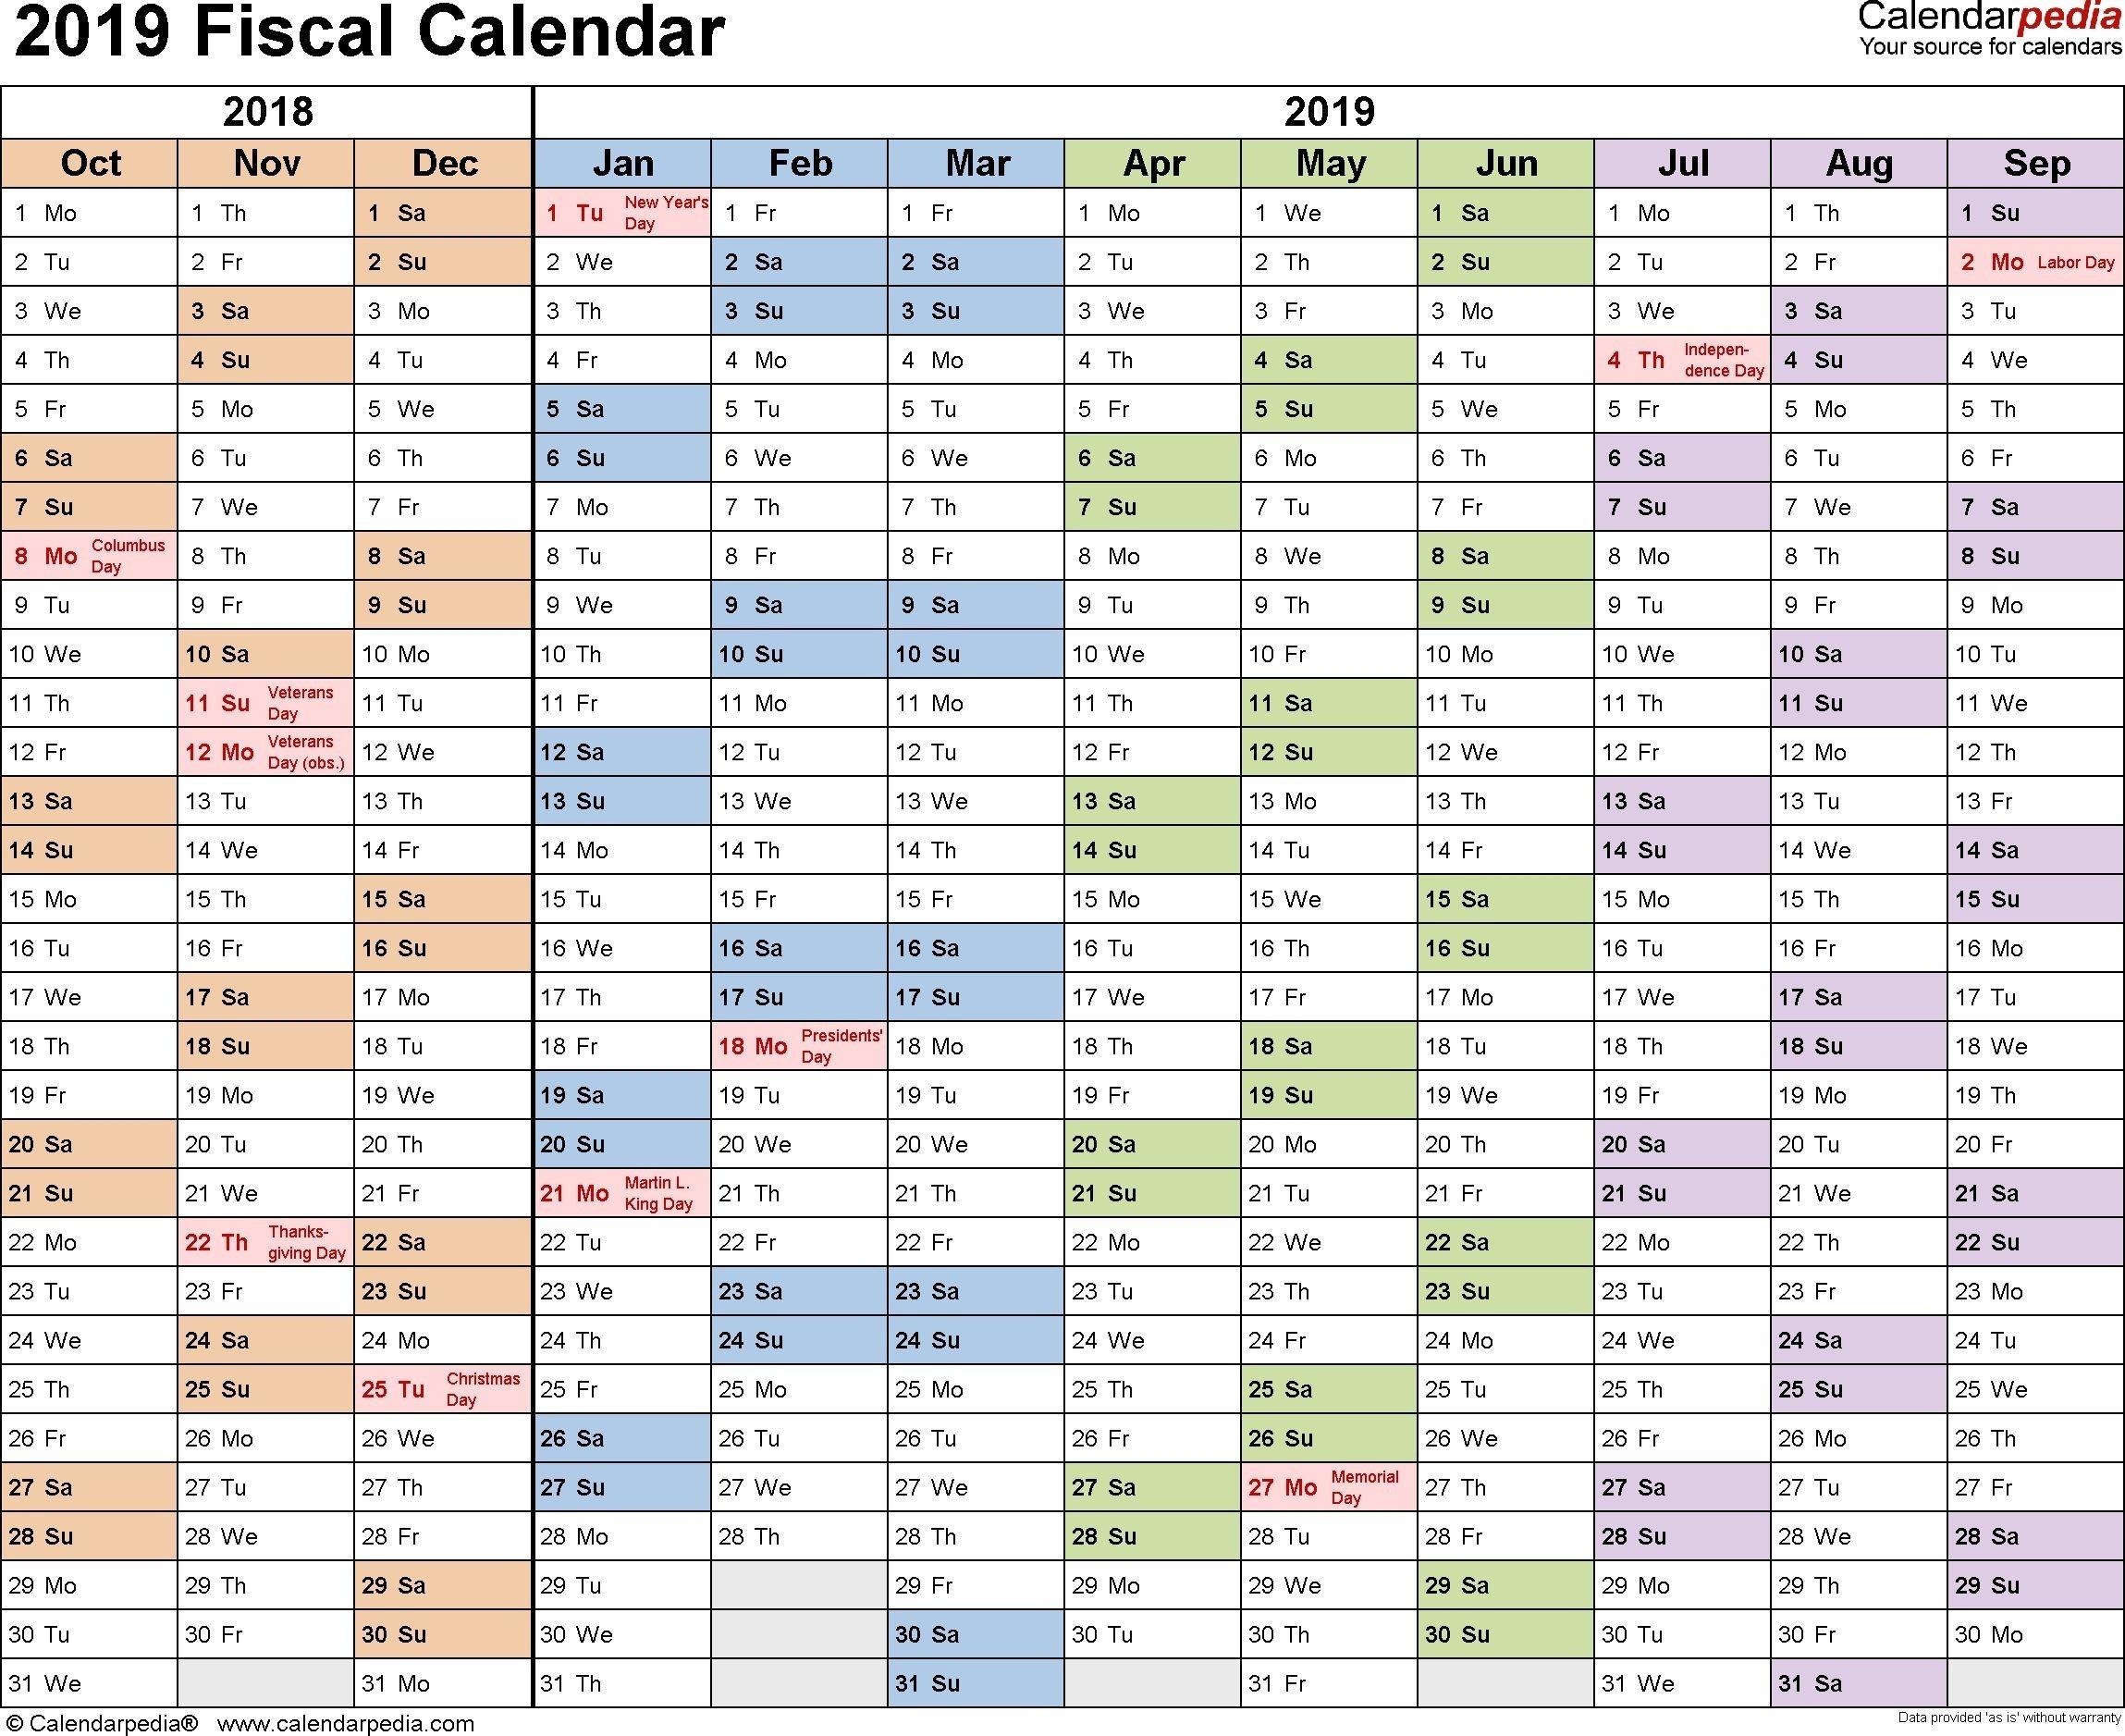 Depo Provera Injection Schedule Calendar 2021 - Template